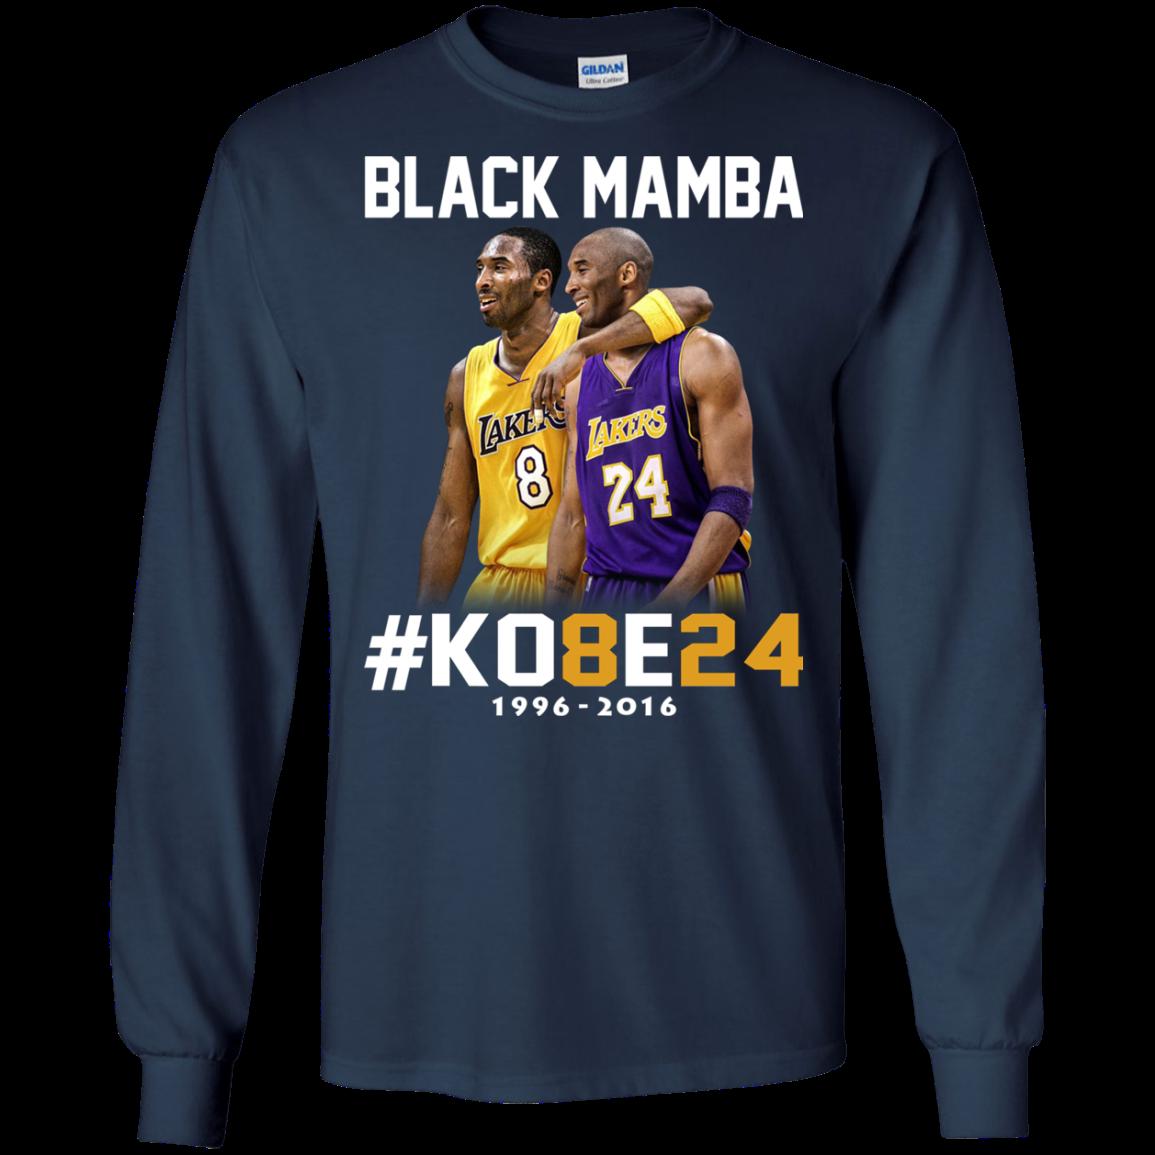 582896458ce Kobe Bryant 24 Black Mamba Shirt